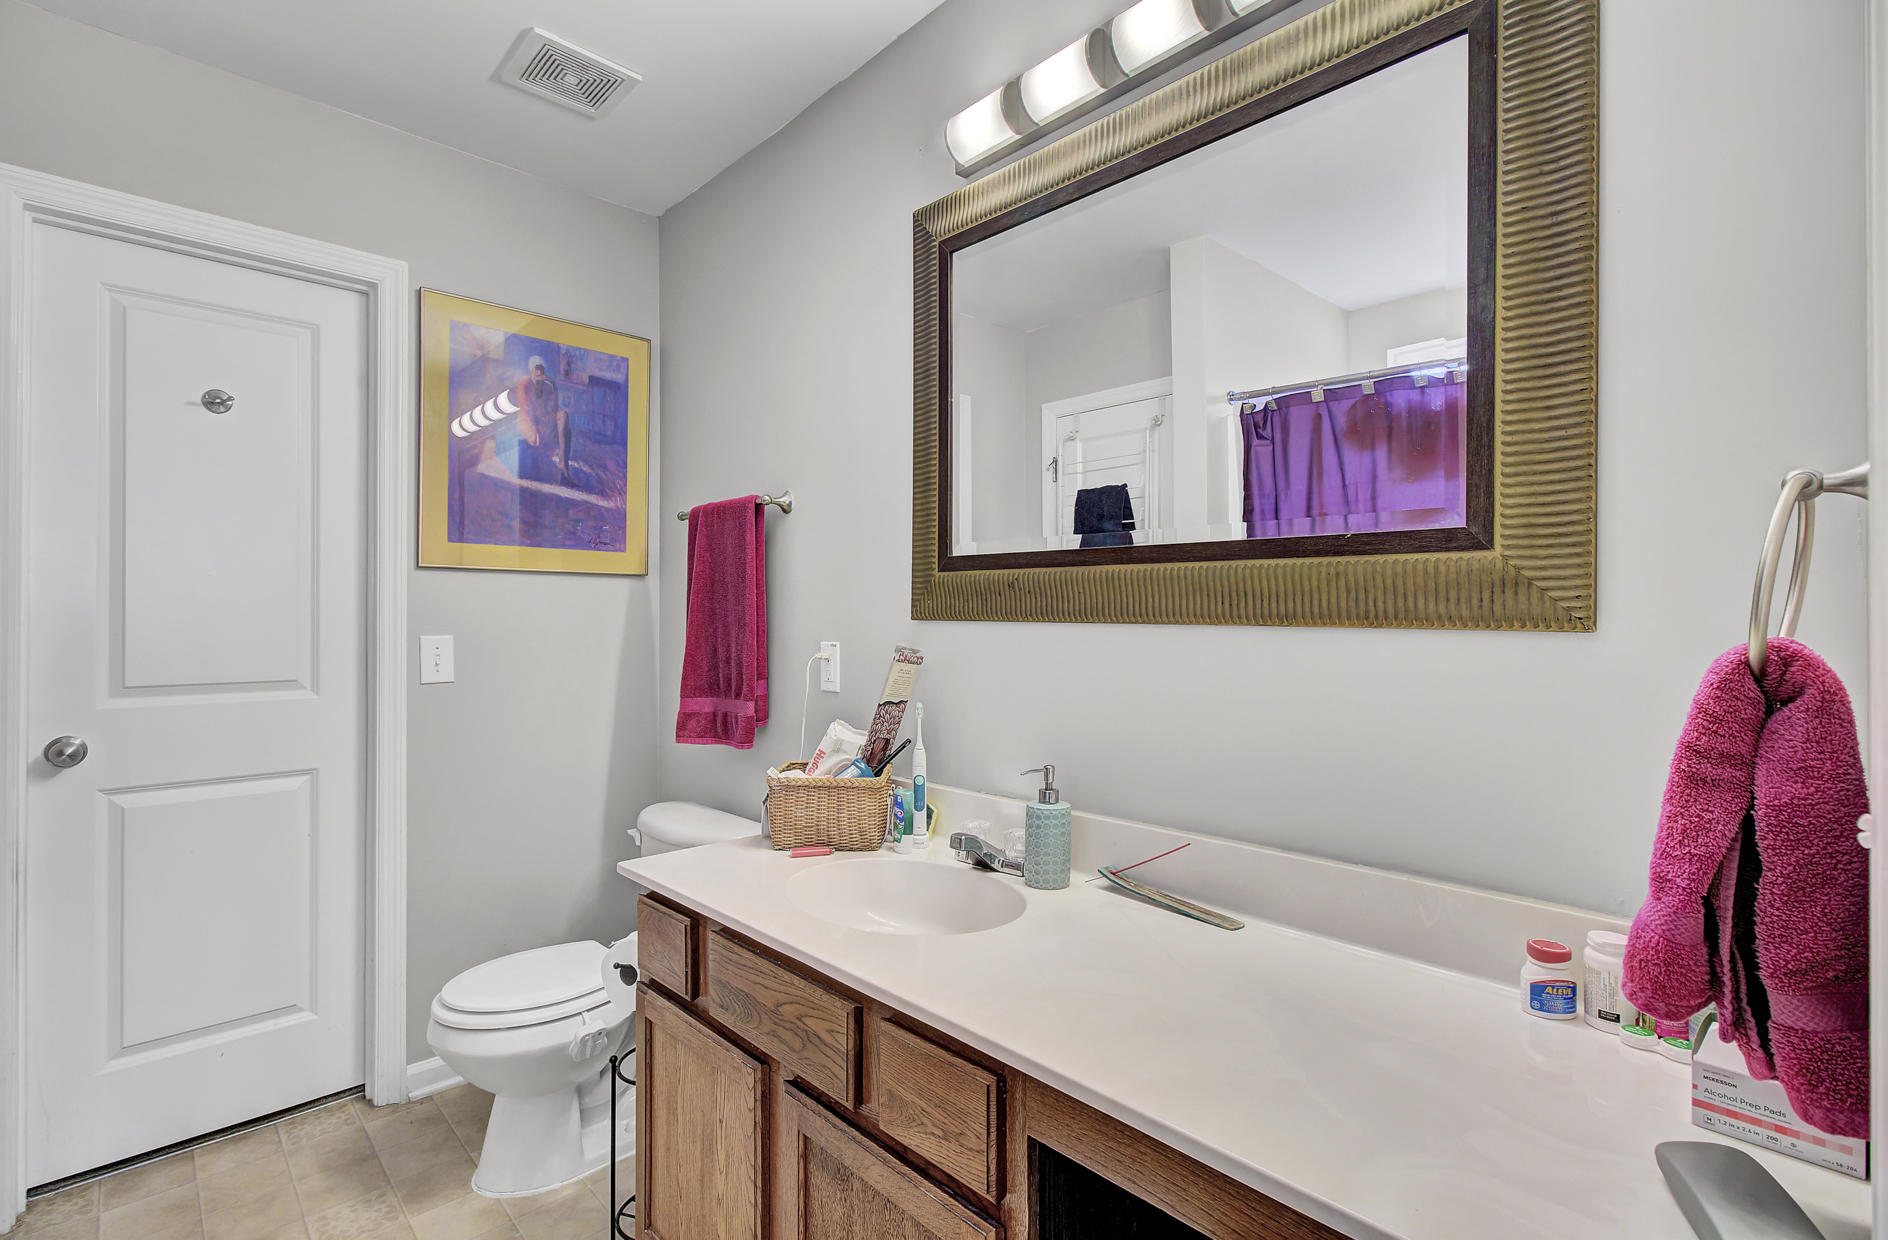 Oakley Pointe Homes For Sale - 231 Silk Oak, Moncks Corner, SC - 17